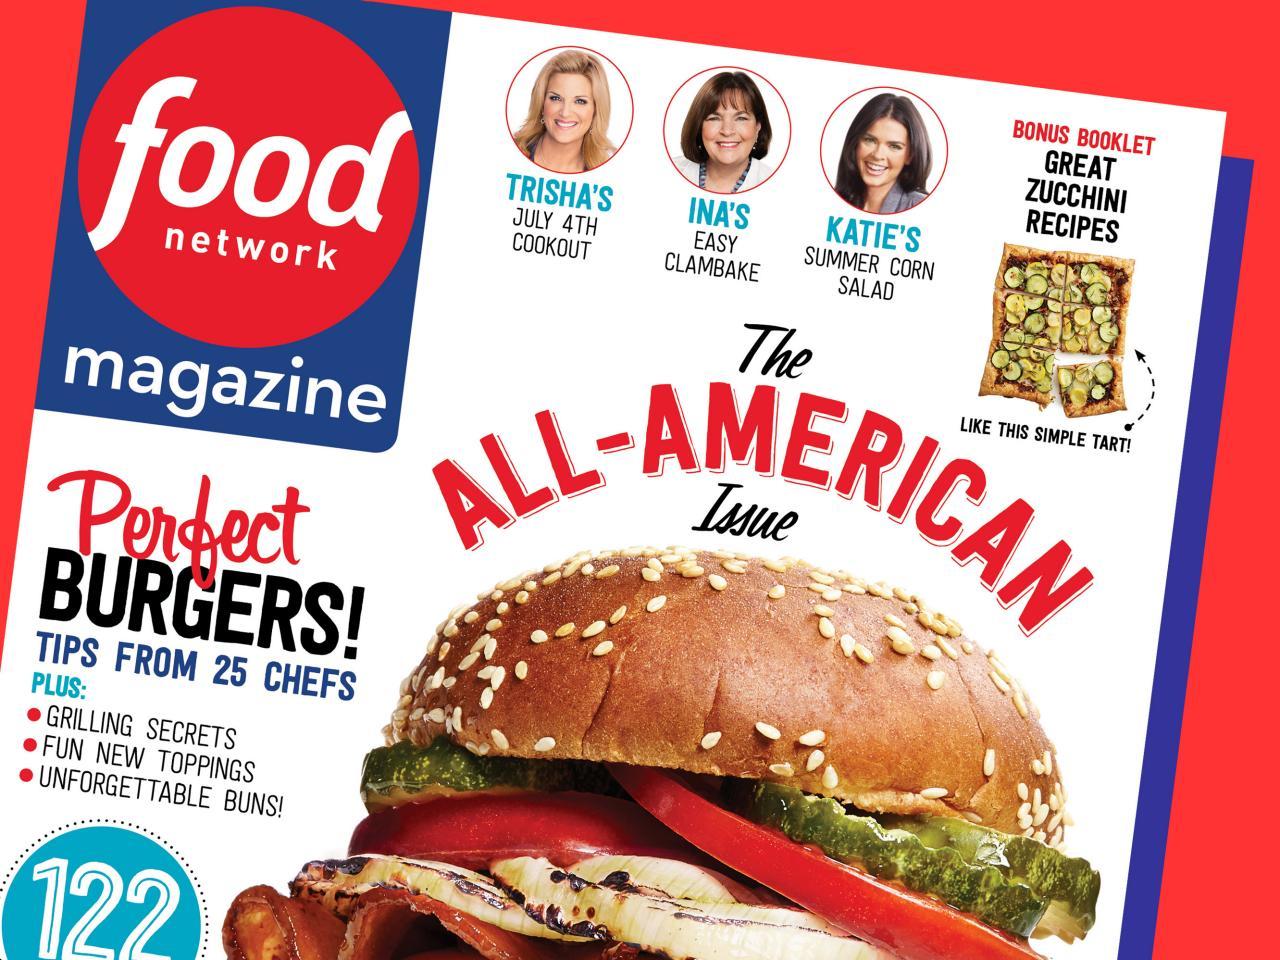 Food network magazine julyaugust 2015 recipe index food network food network magazine julyaugust 2015 recipe index forumfinder Image collections